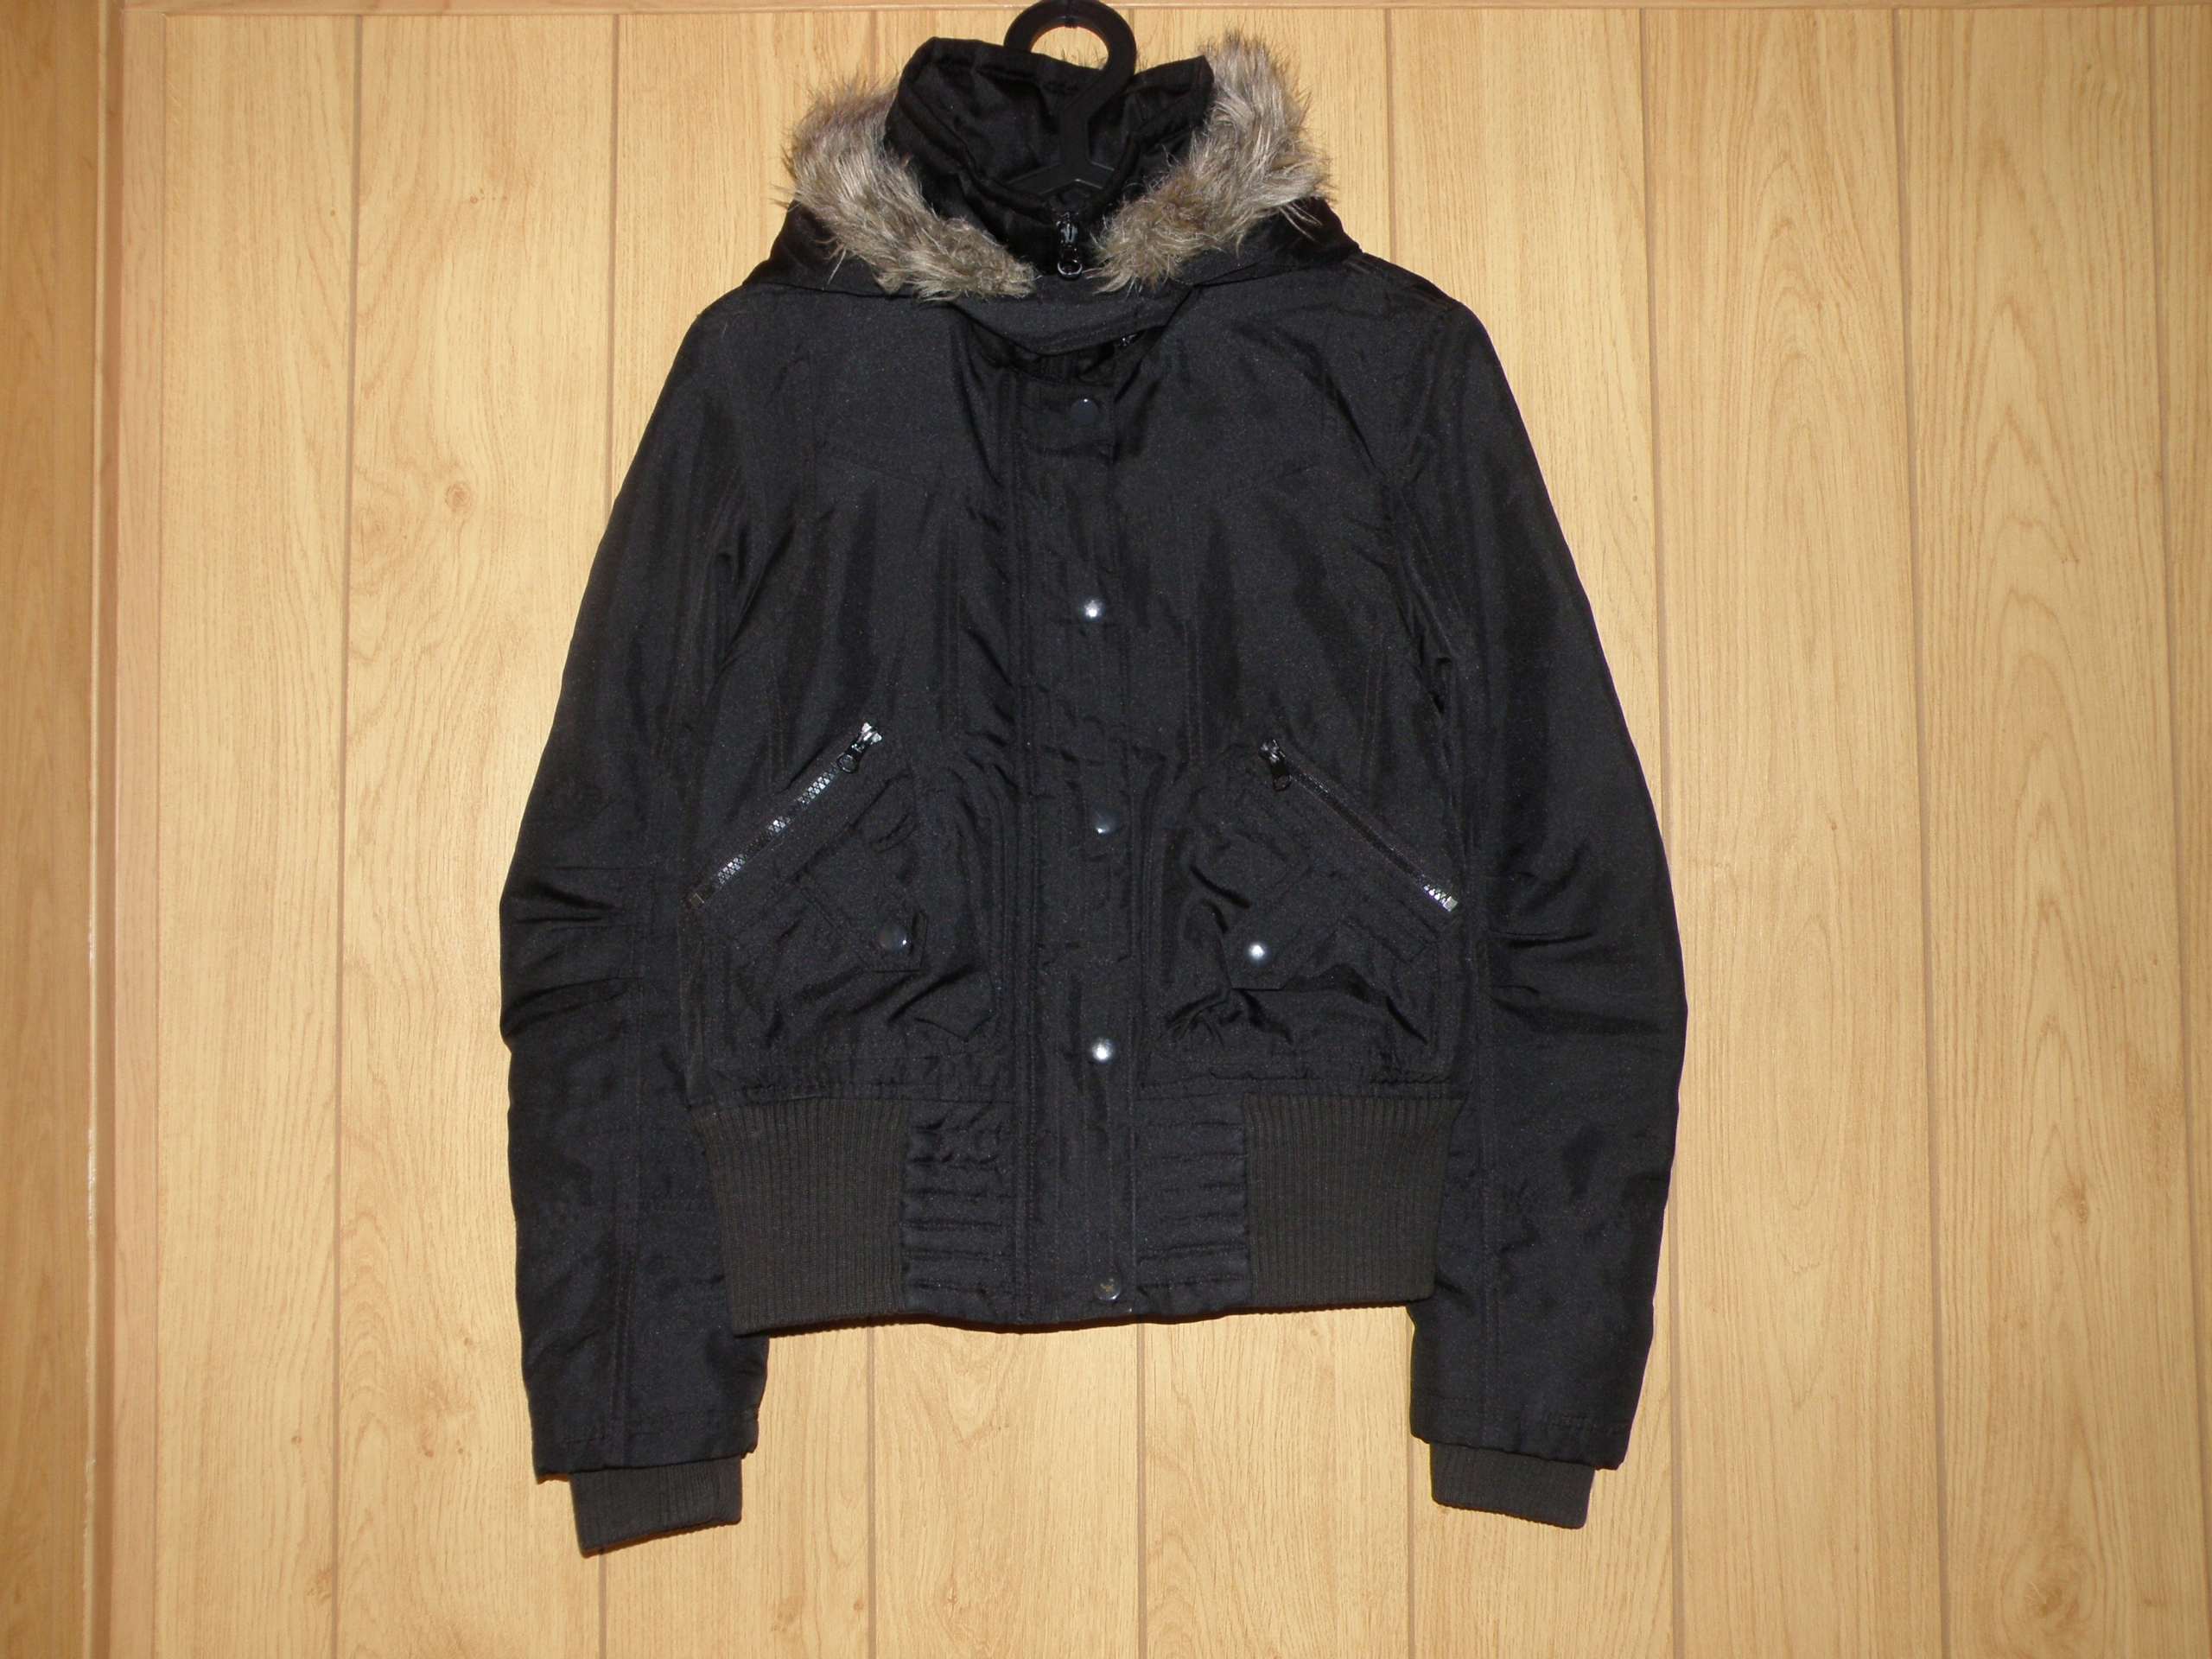 56bbc5448c Czarna kurtka VERO MODA rozmiar S ( 36 ) - 7560595258 - oficjalne ...